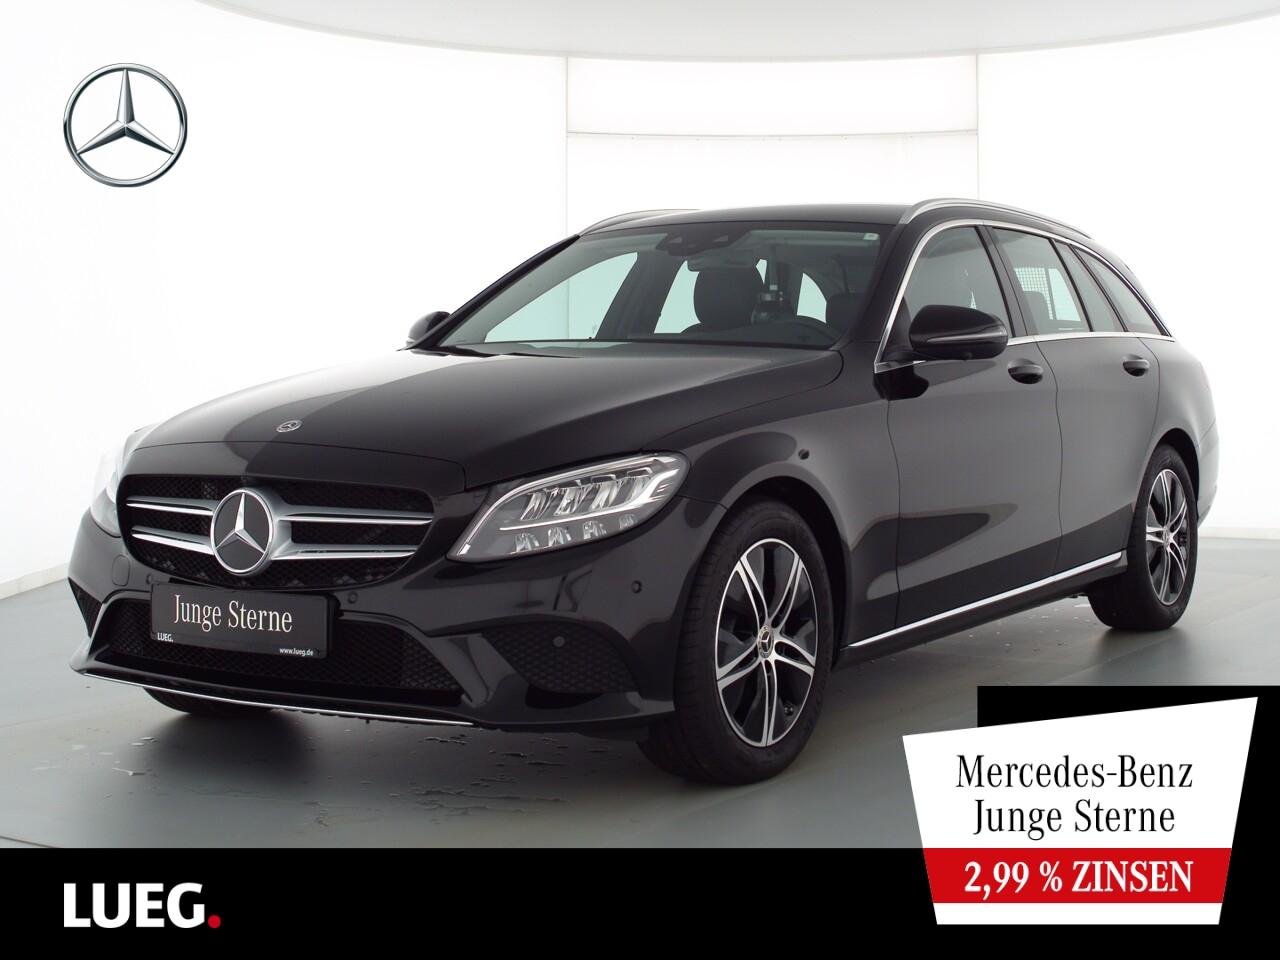 Mercedes-Benz C 180 T Avantgarde+Navi+LED-HP+SpurP+EHeckk+360°, Jahr 2021, Benzin